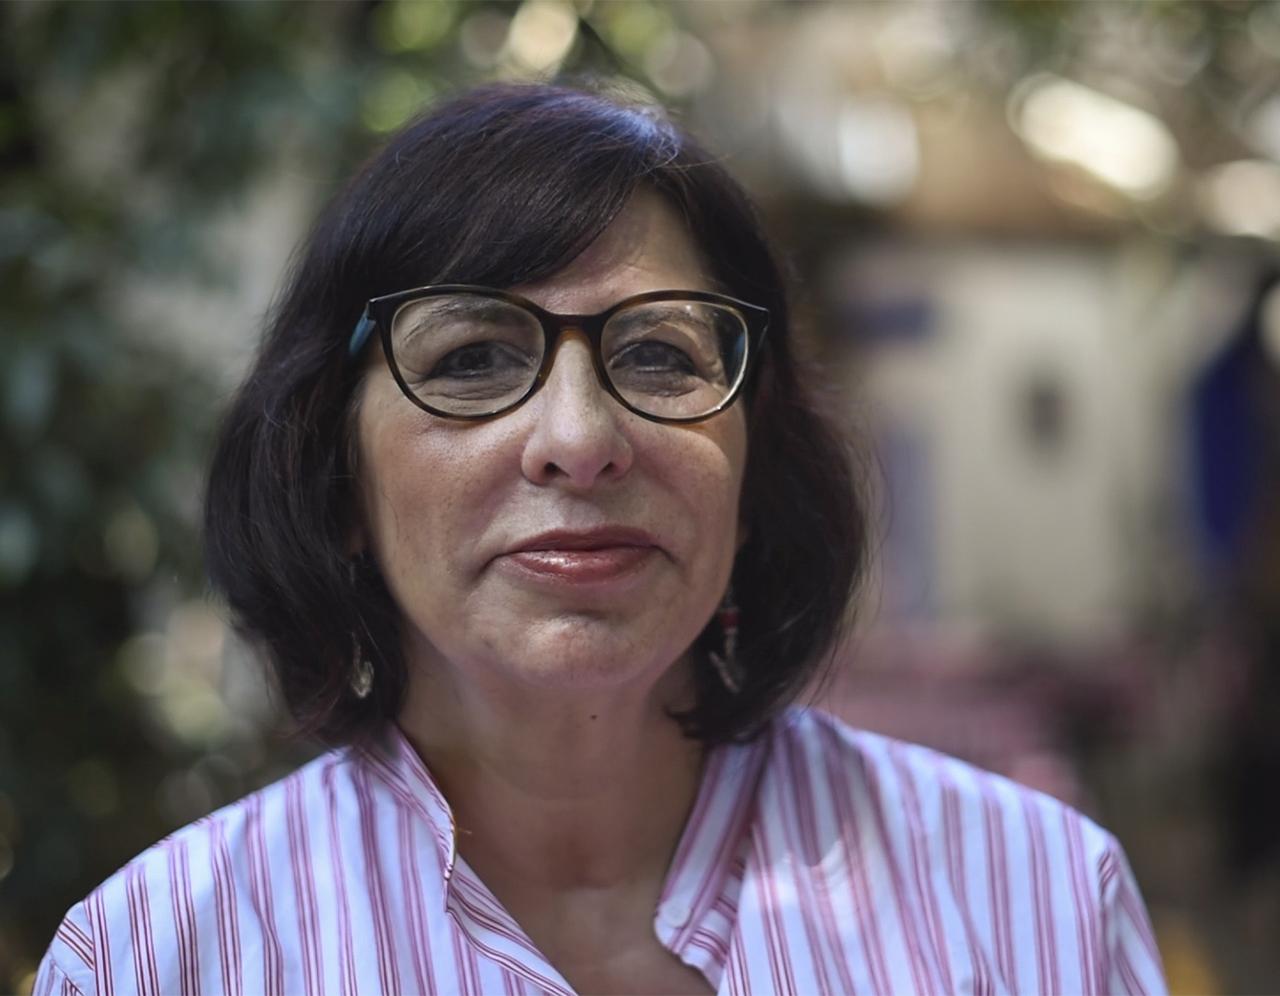 Kyra Galván